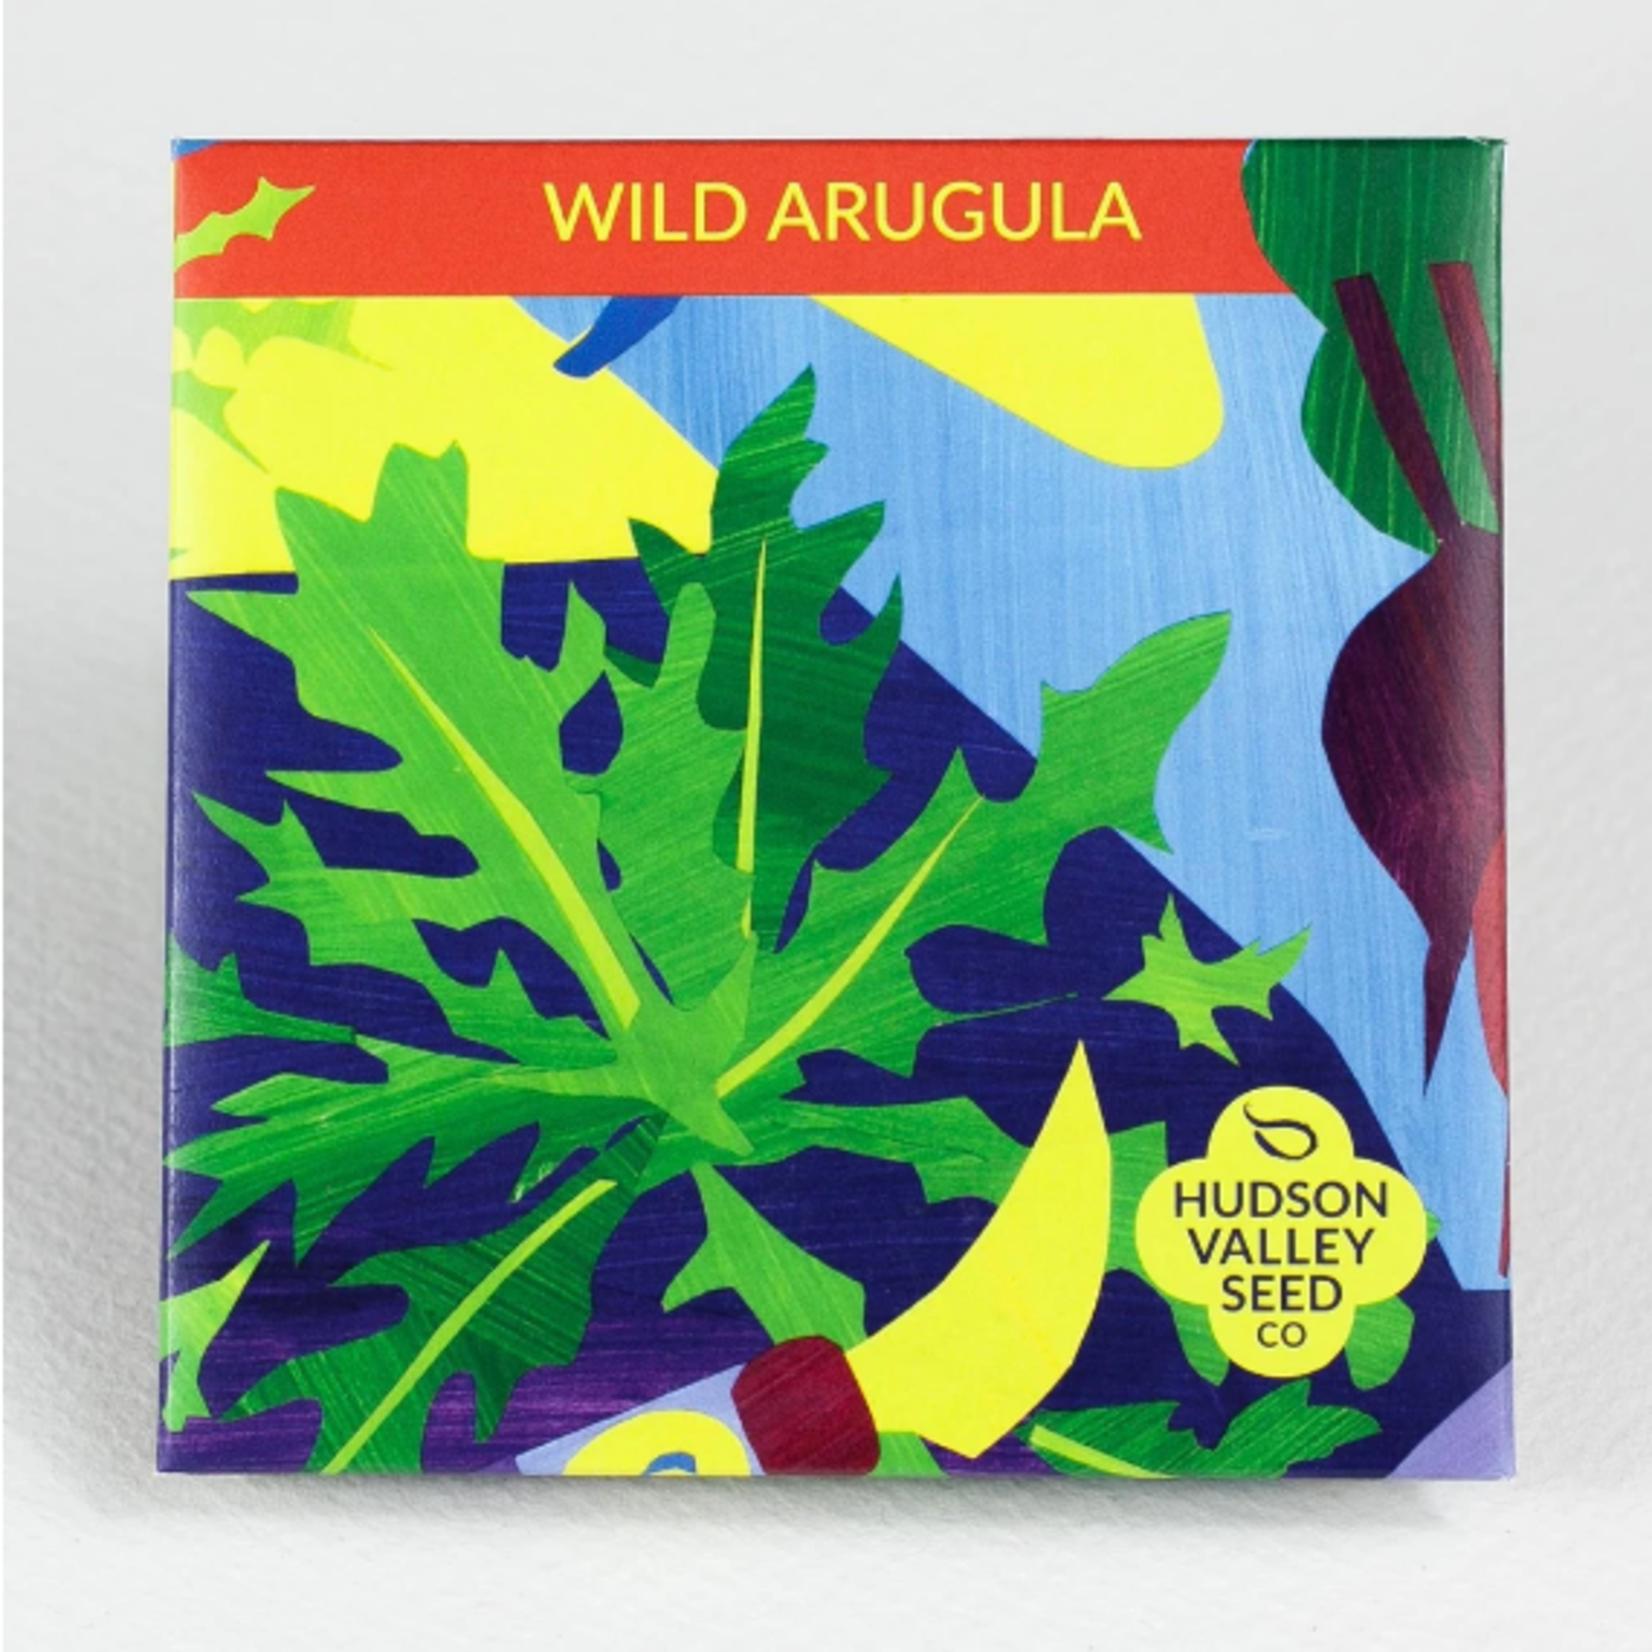 Hudson Valley Seeds Wild Arugula Seeds